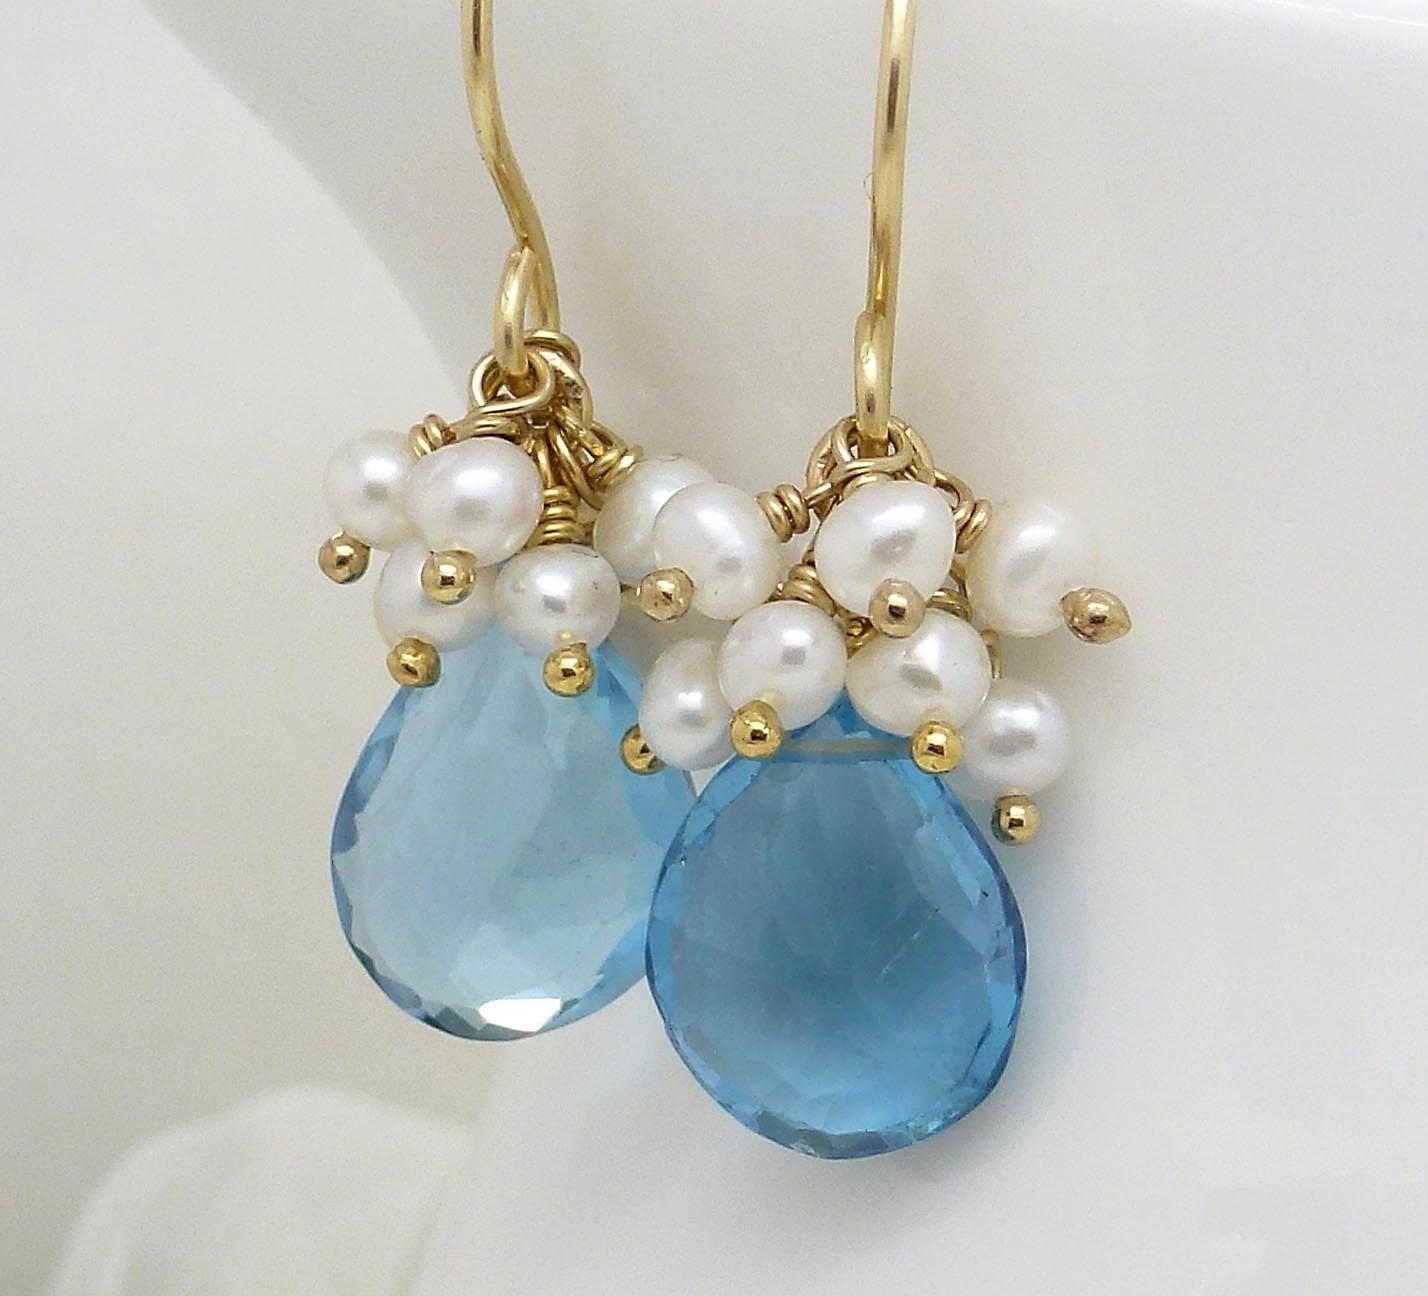 london blue topaz earrings gold blue topaz by. Black Bedroom Furniture Sets. Home Design Ideas